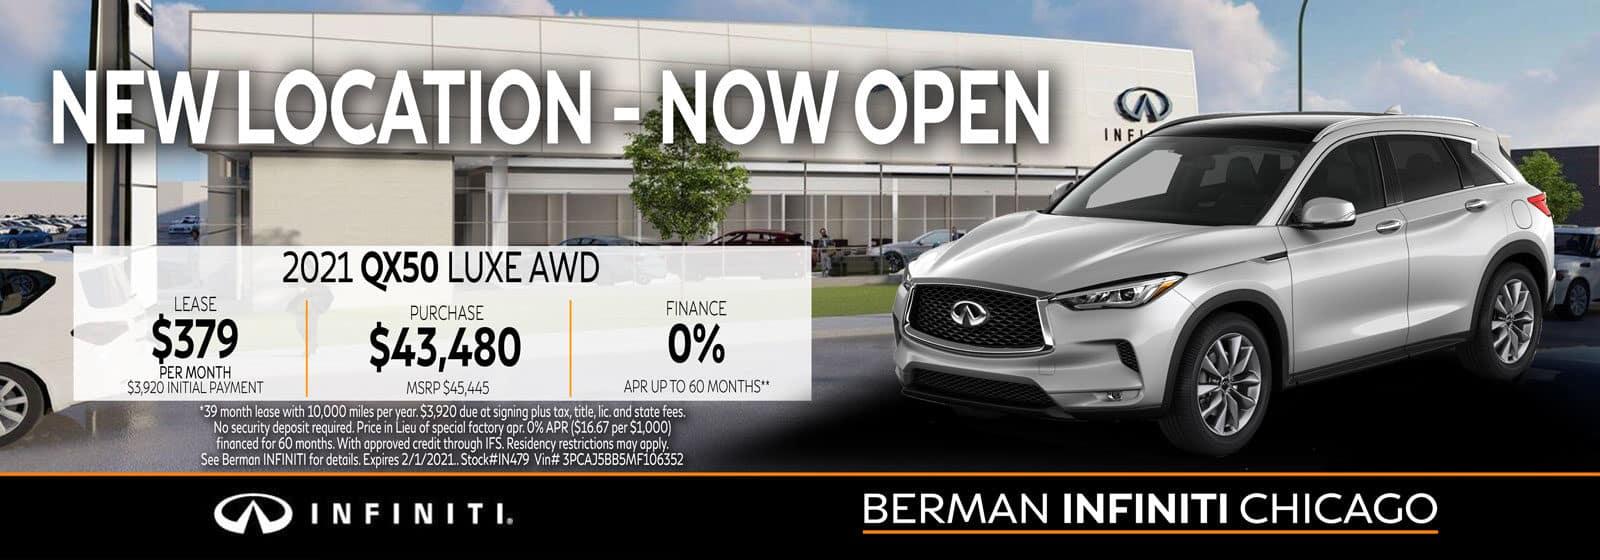 New 2021 INFINITI QX50 January offer at Berman INFINITI Chicago!